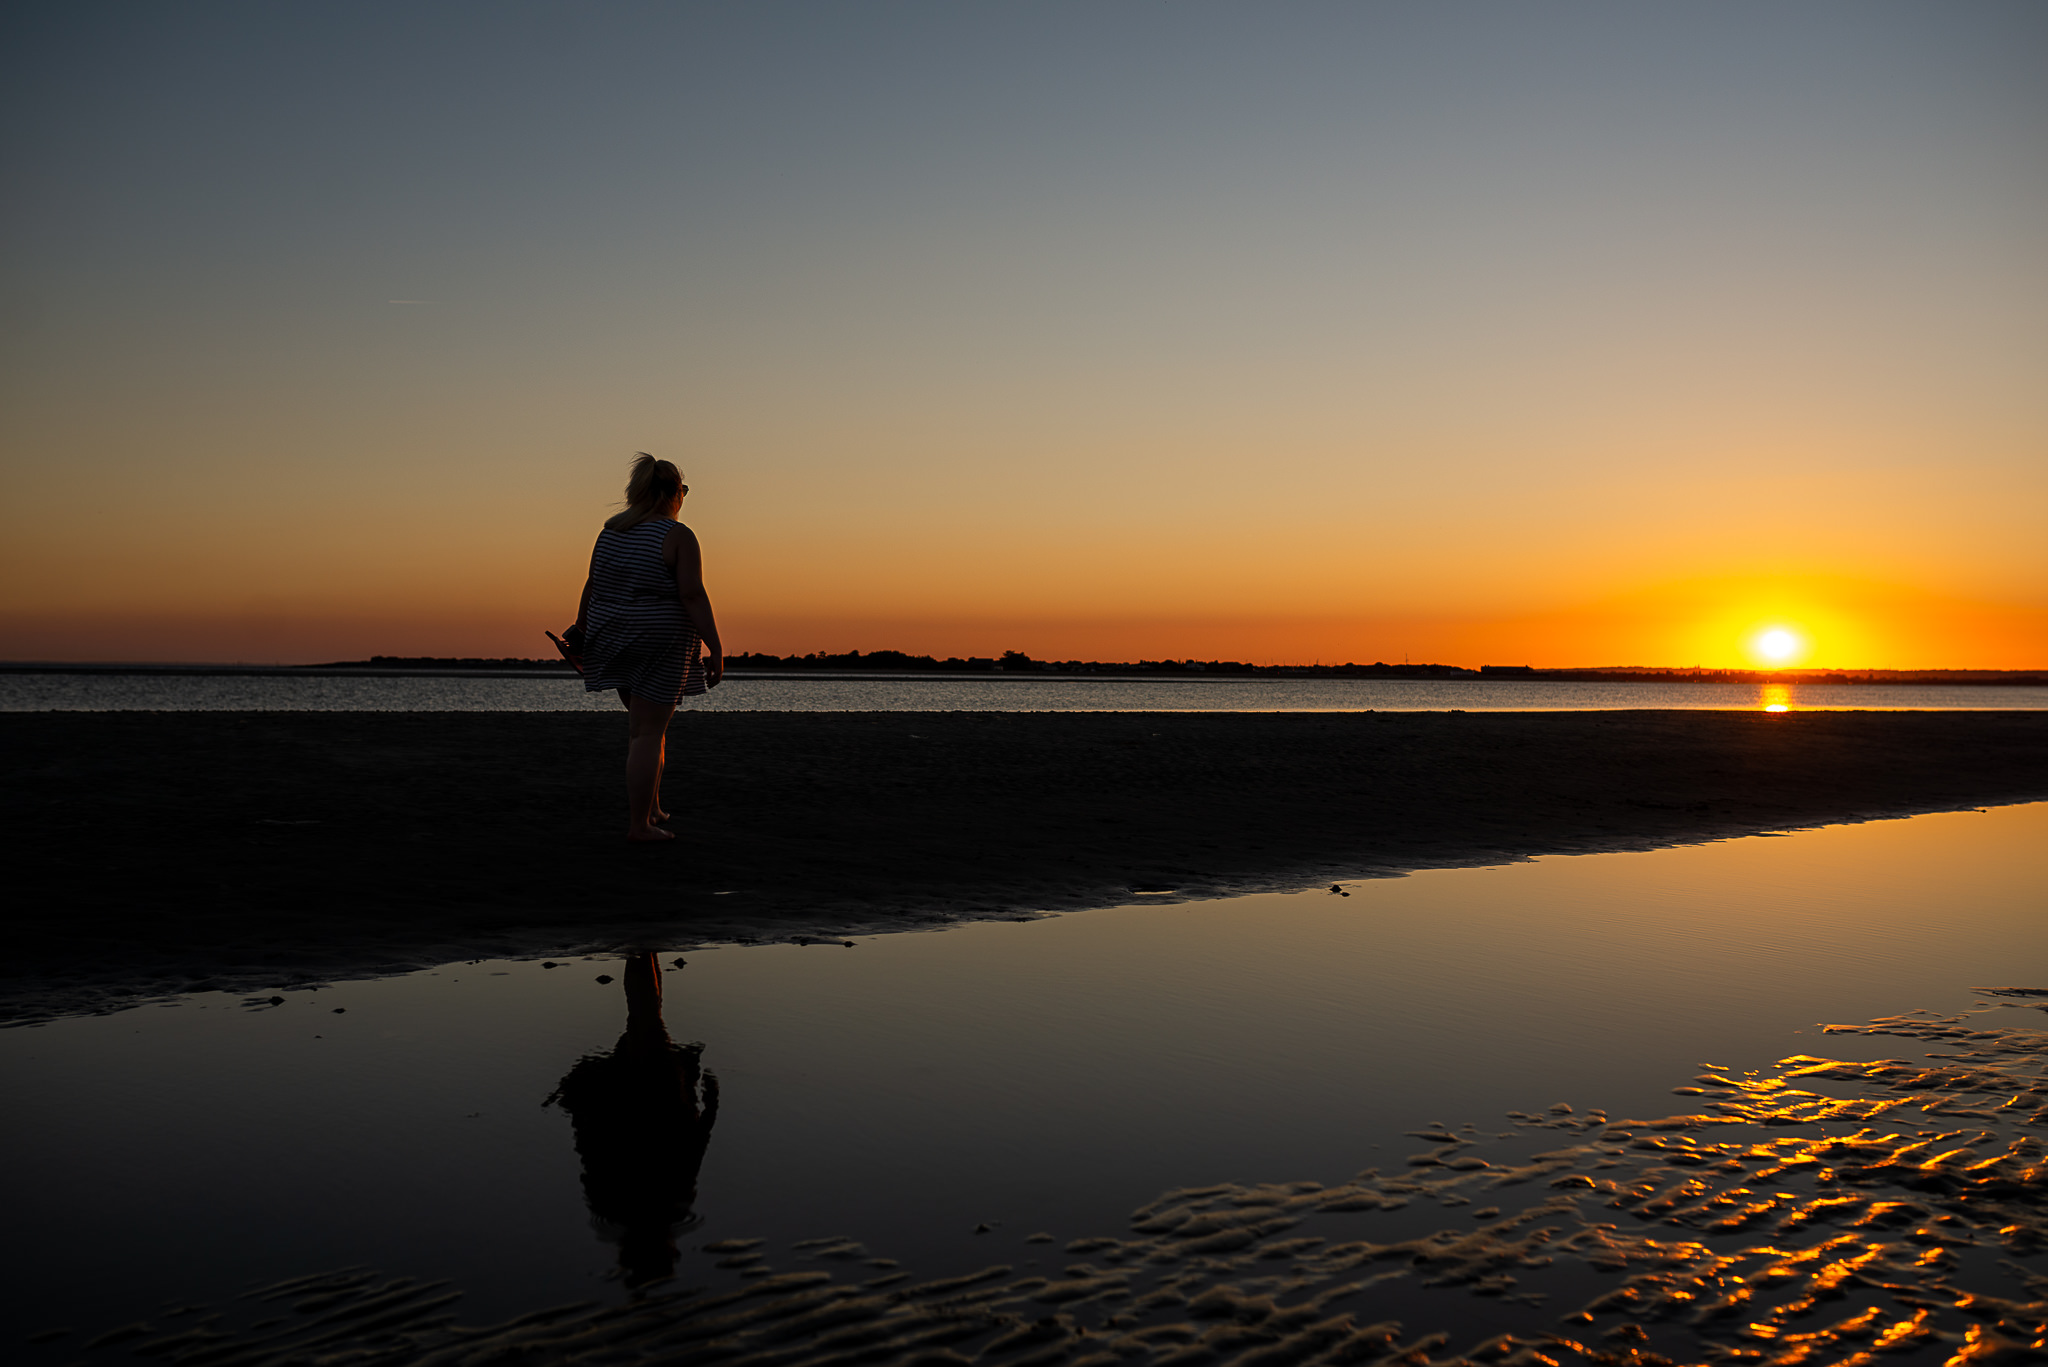 West-Wittering-Beach-Daniel-Robinson-Photography-10.jpg